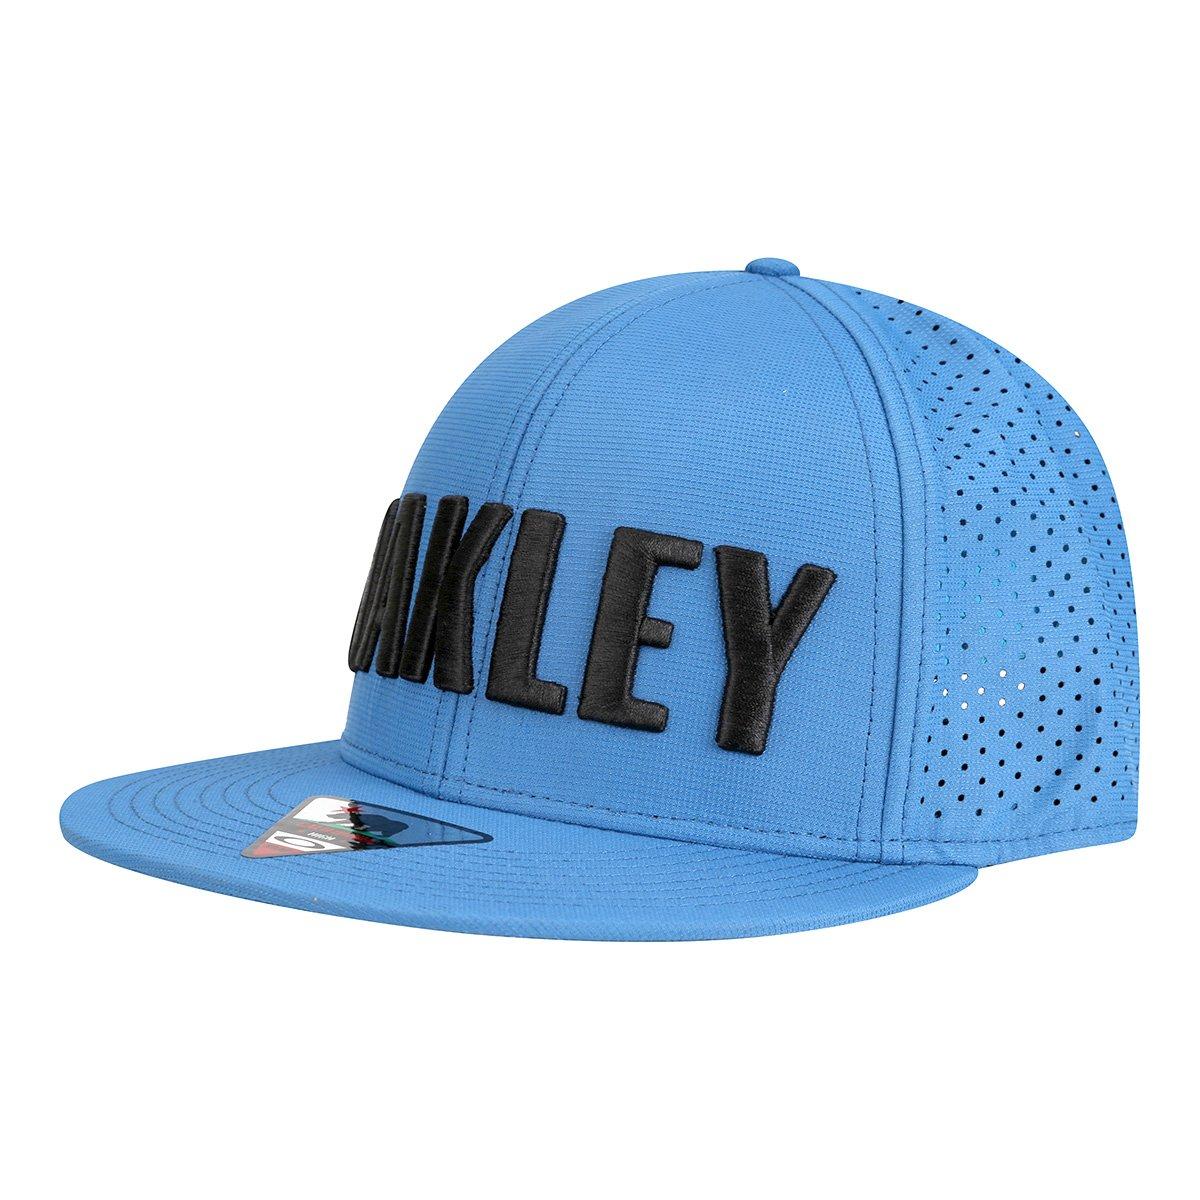 Boné Oakley Aba Reta Mod Perf Hat - Compre Agora  f36da941c4be2